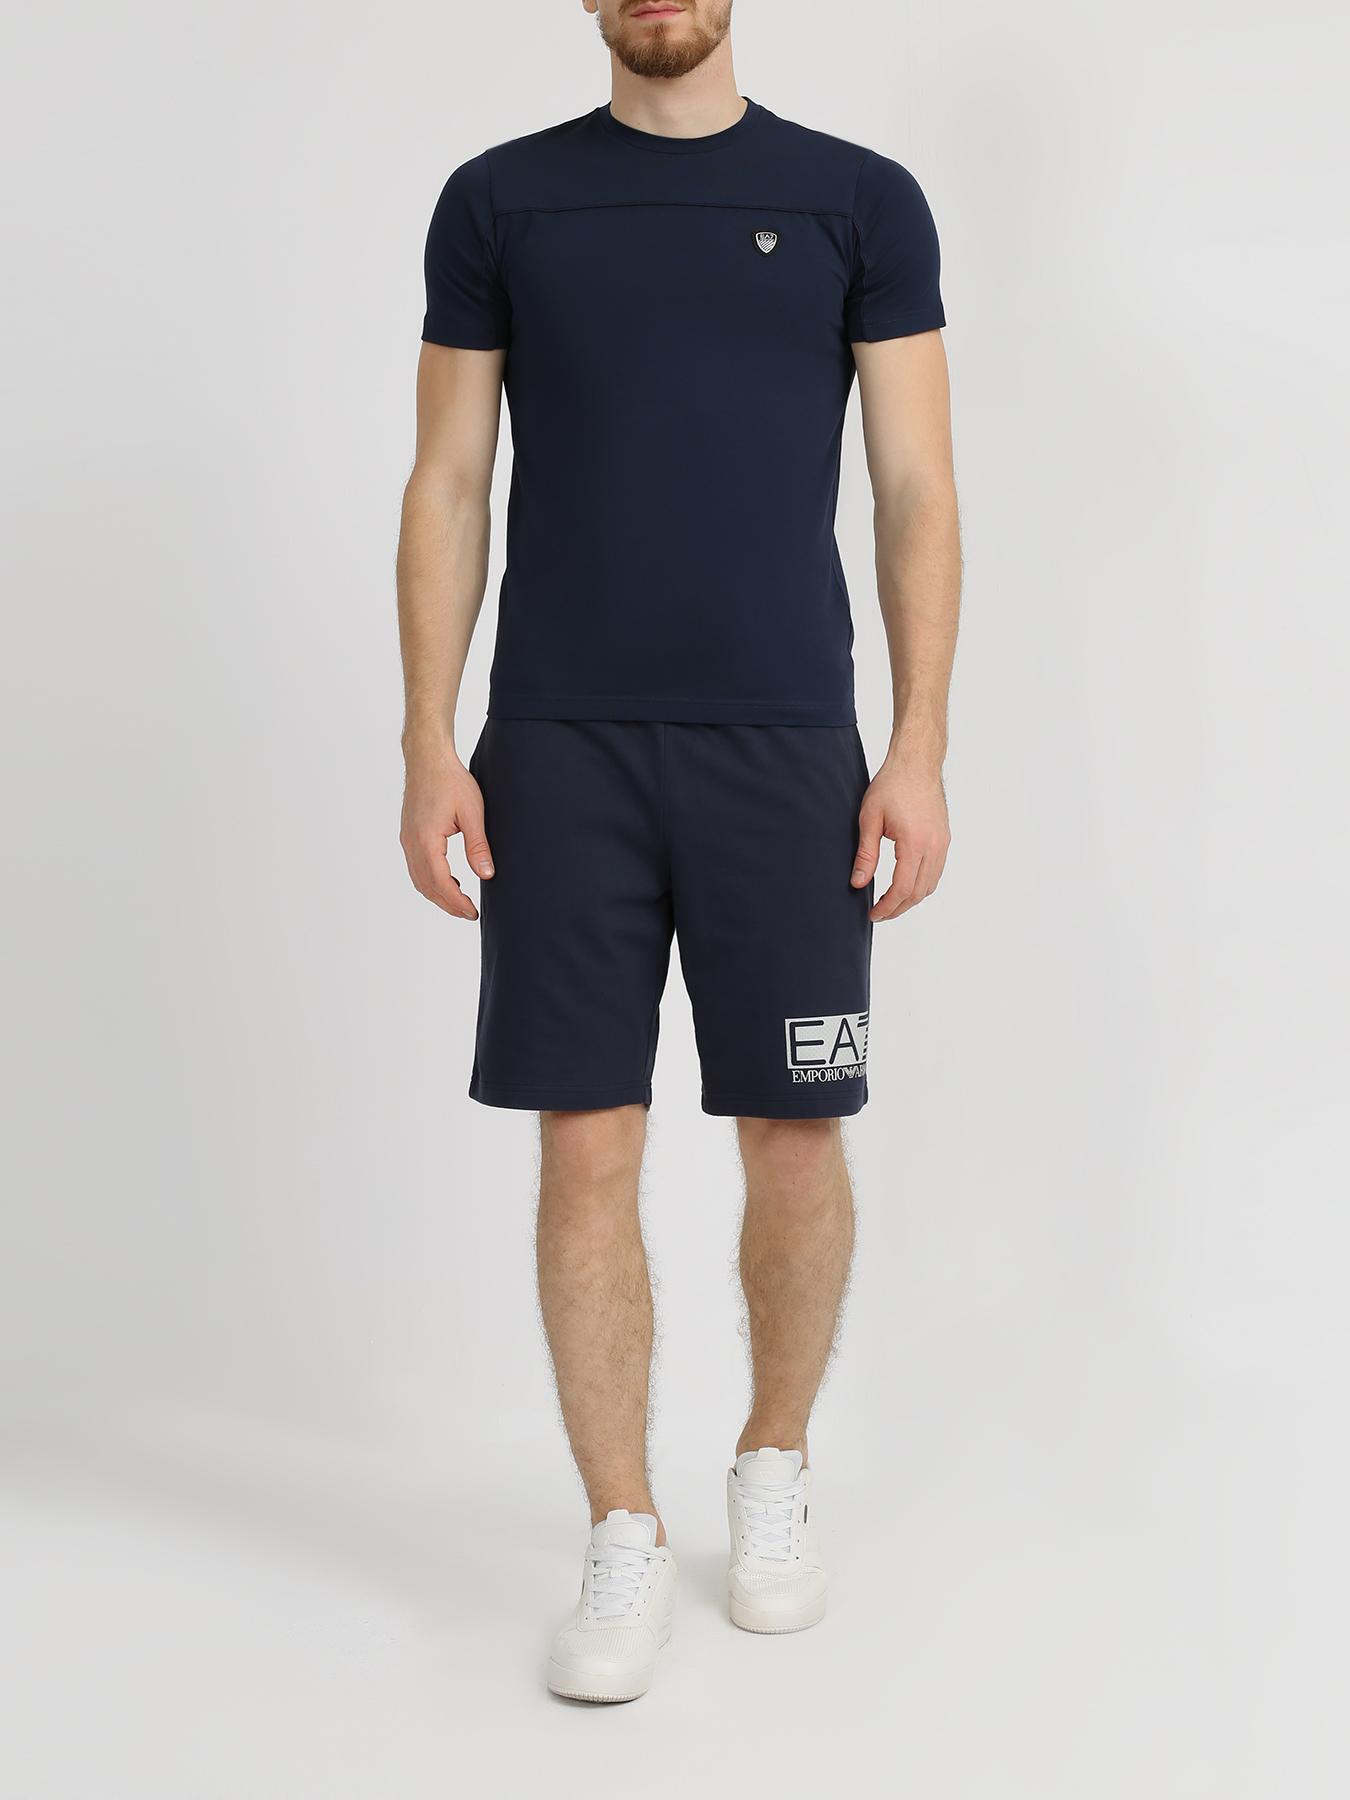 цена на Фуфайка EA7 Emporio Armani Спортивная футболка с принтом на спине